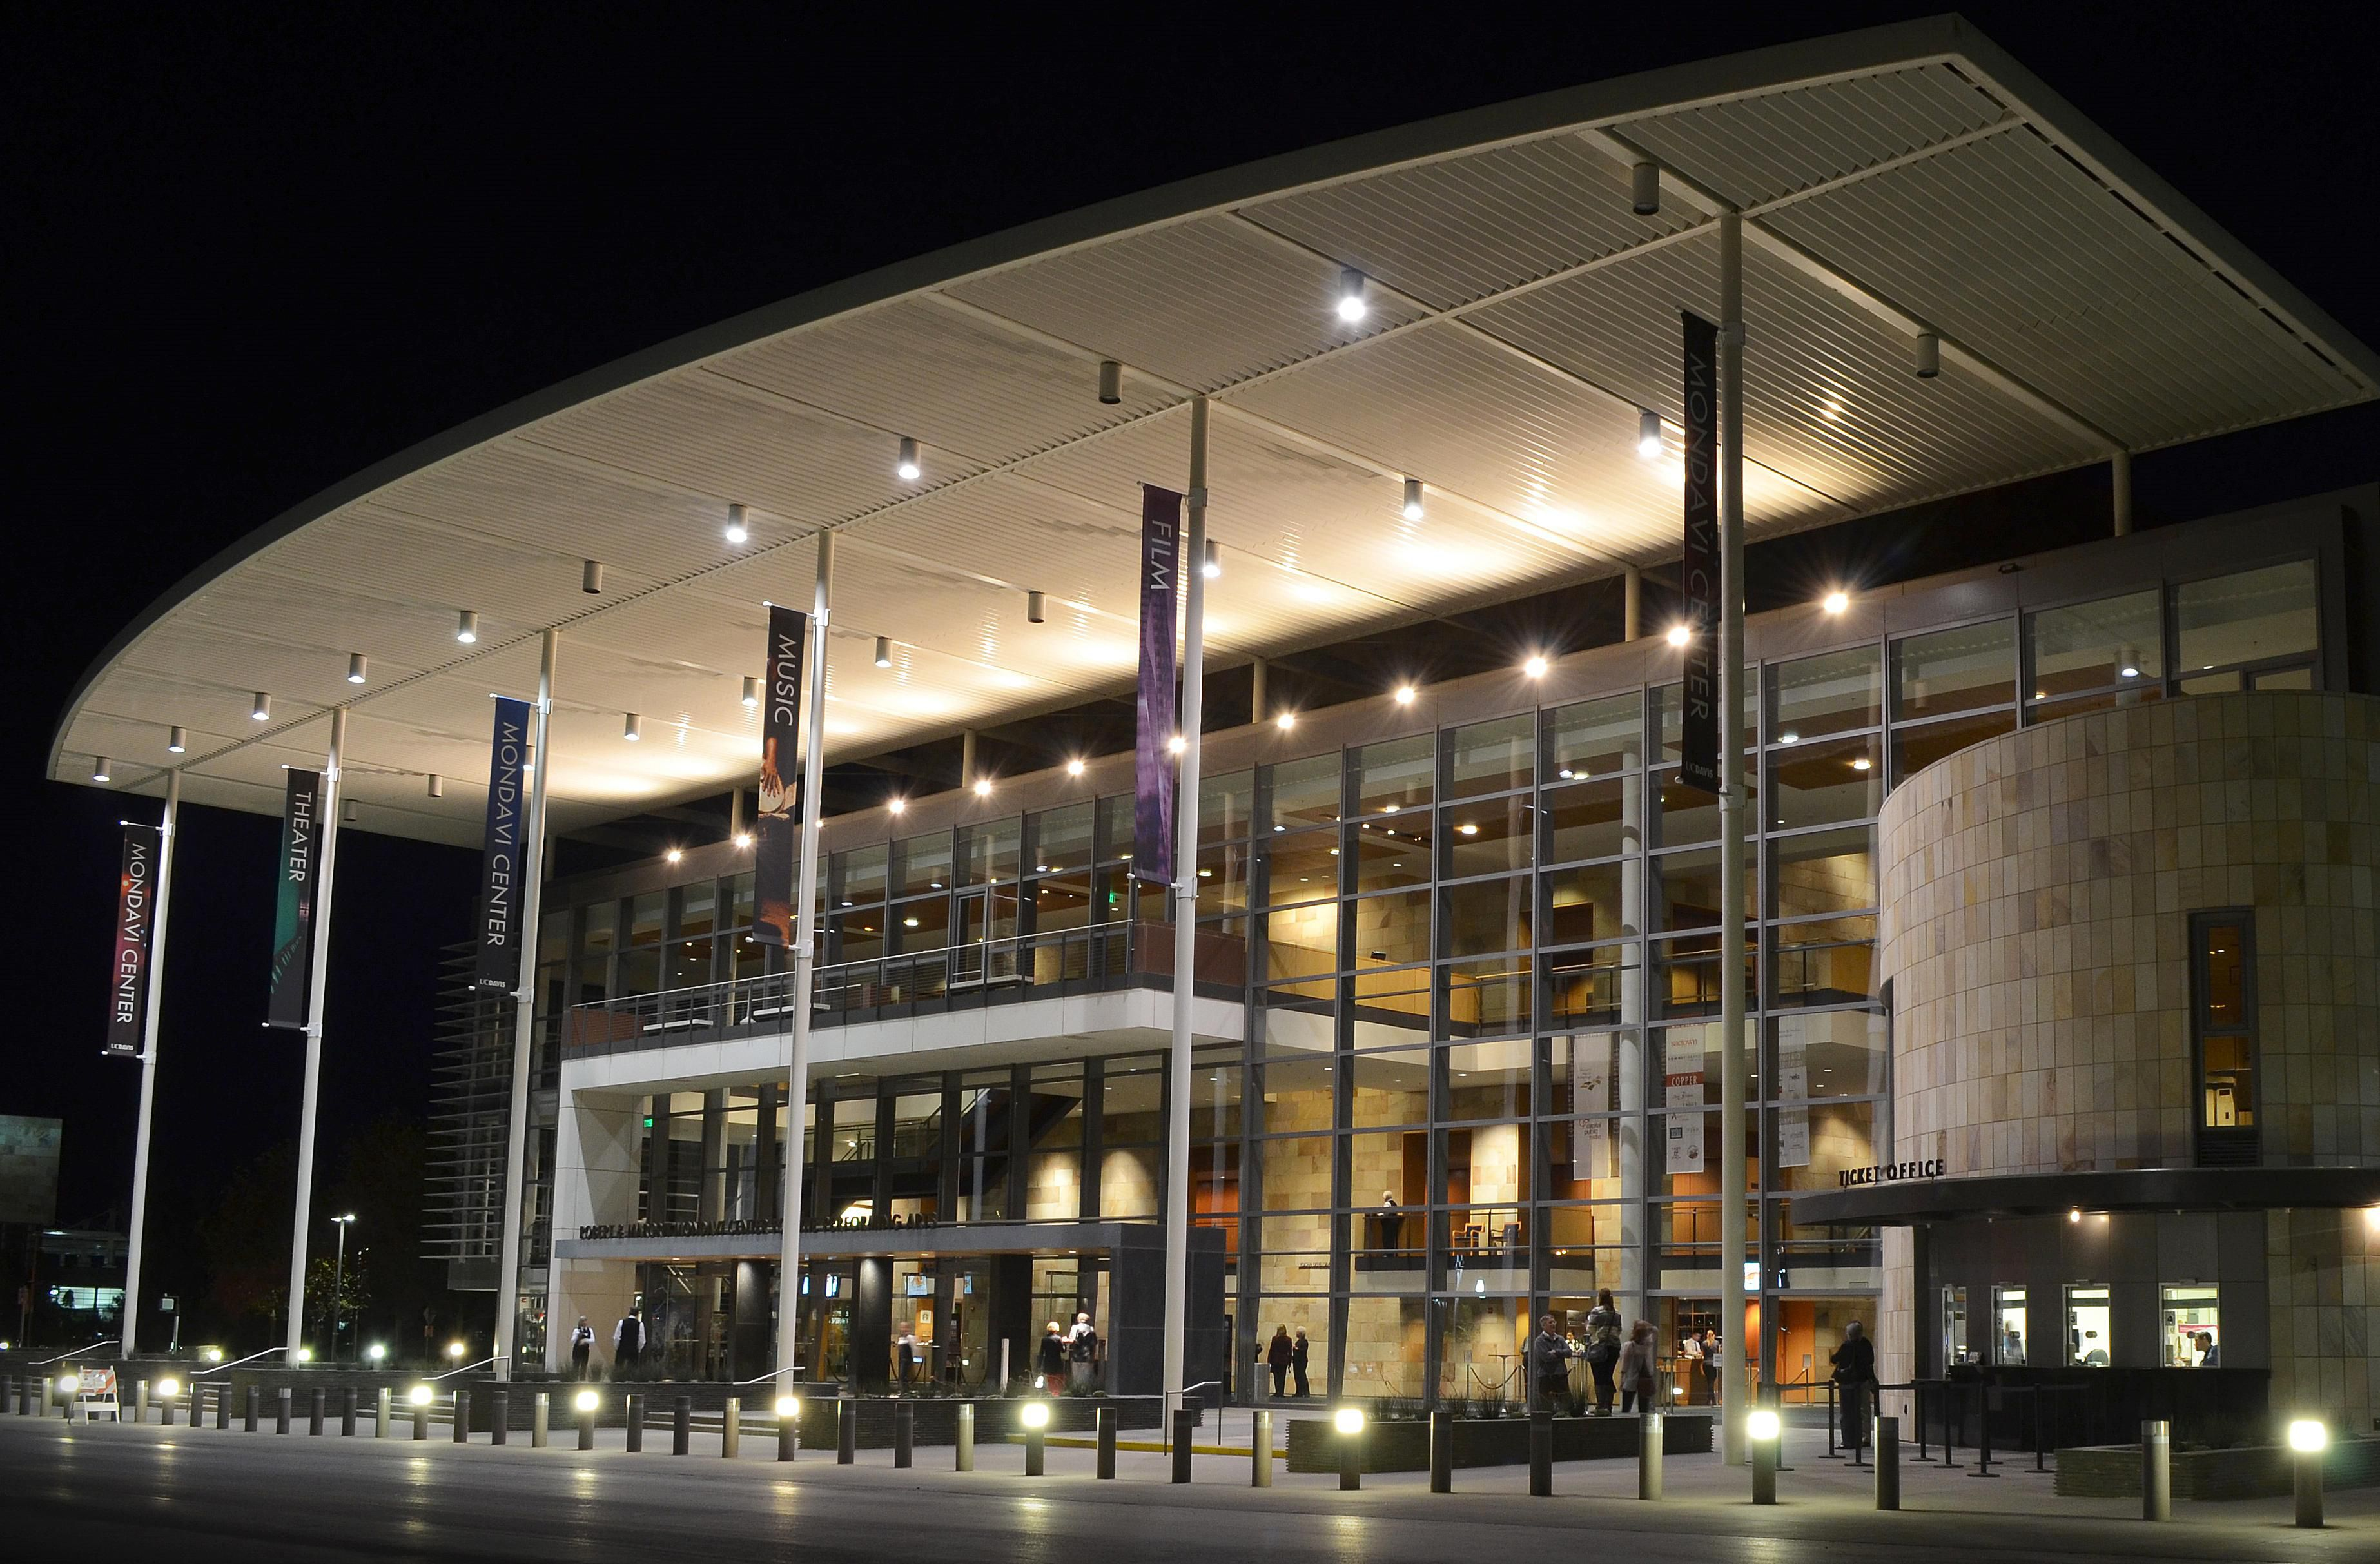 The Mondavi Center for the Performing Arts at UC Davis